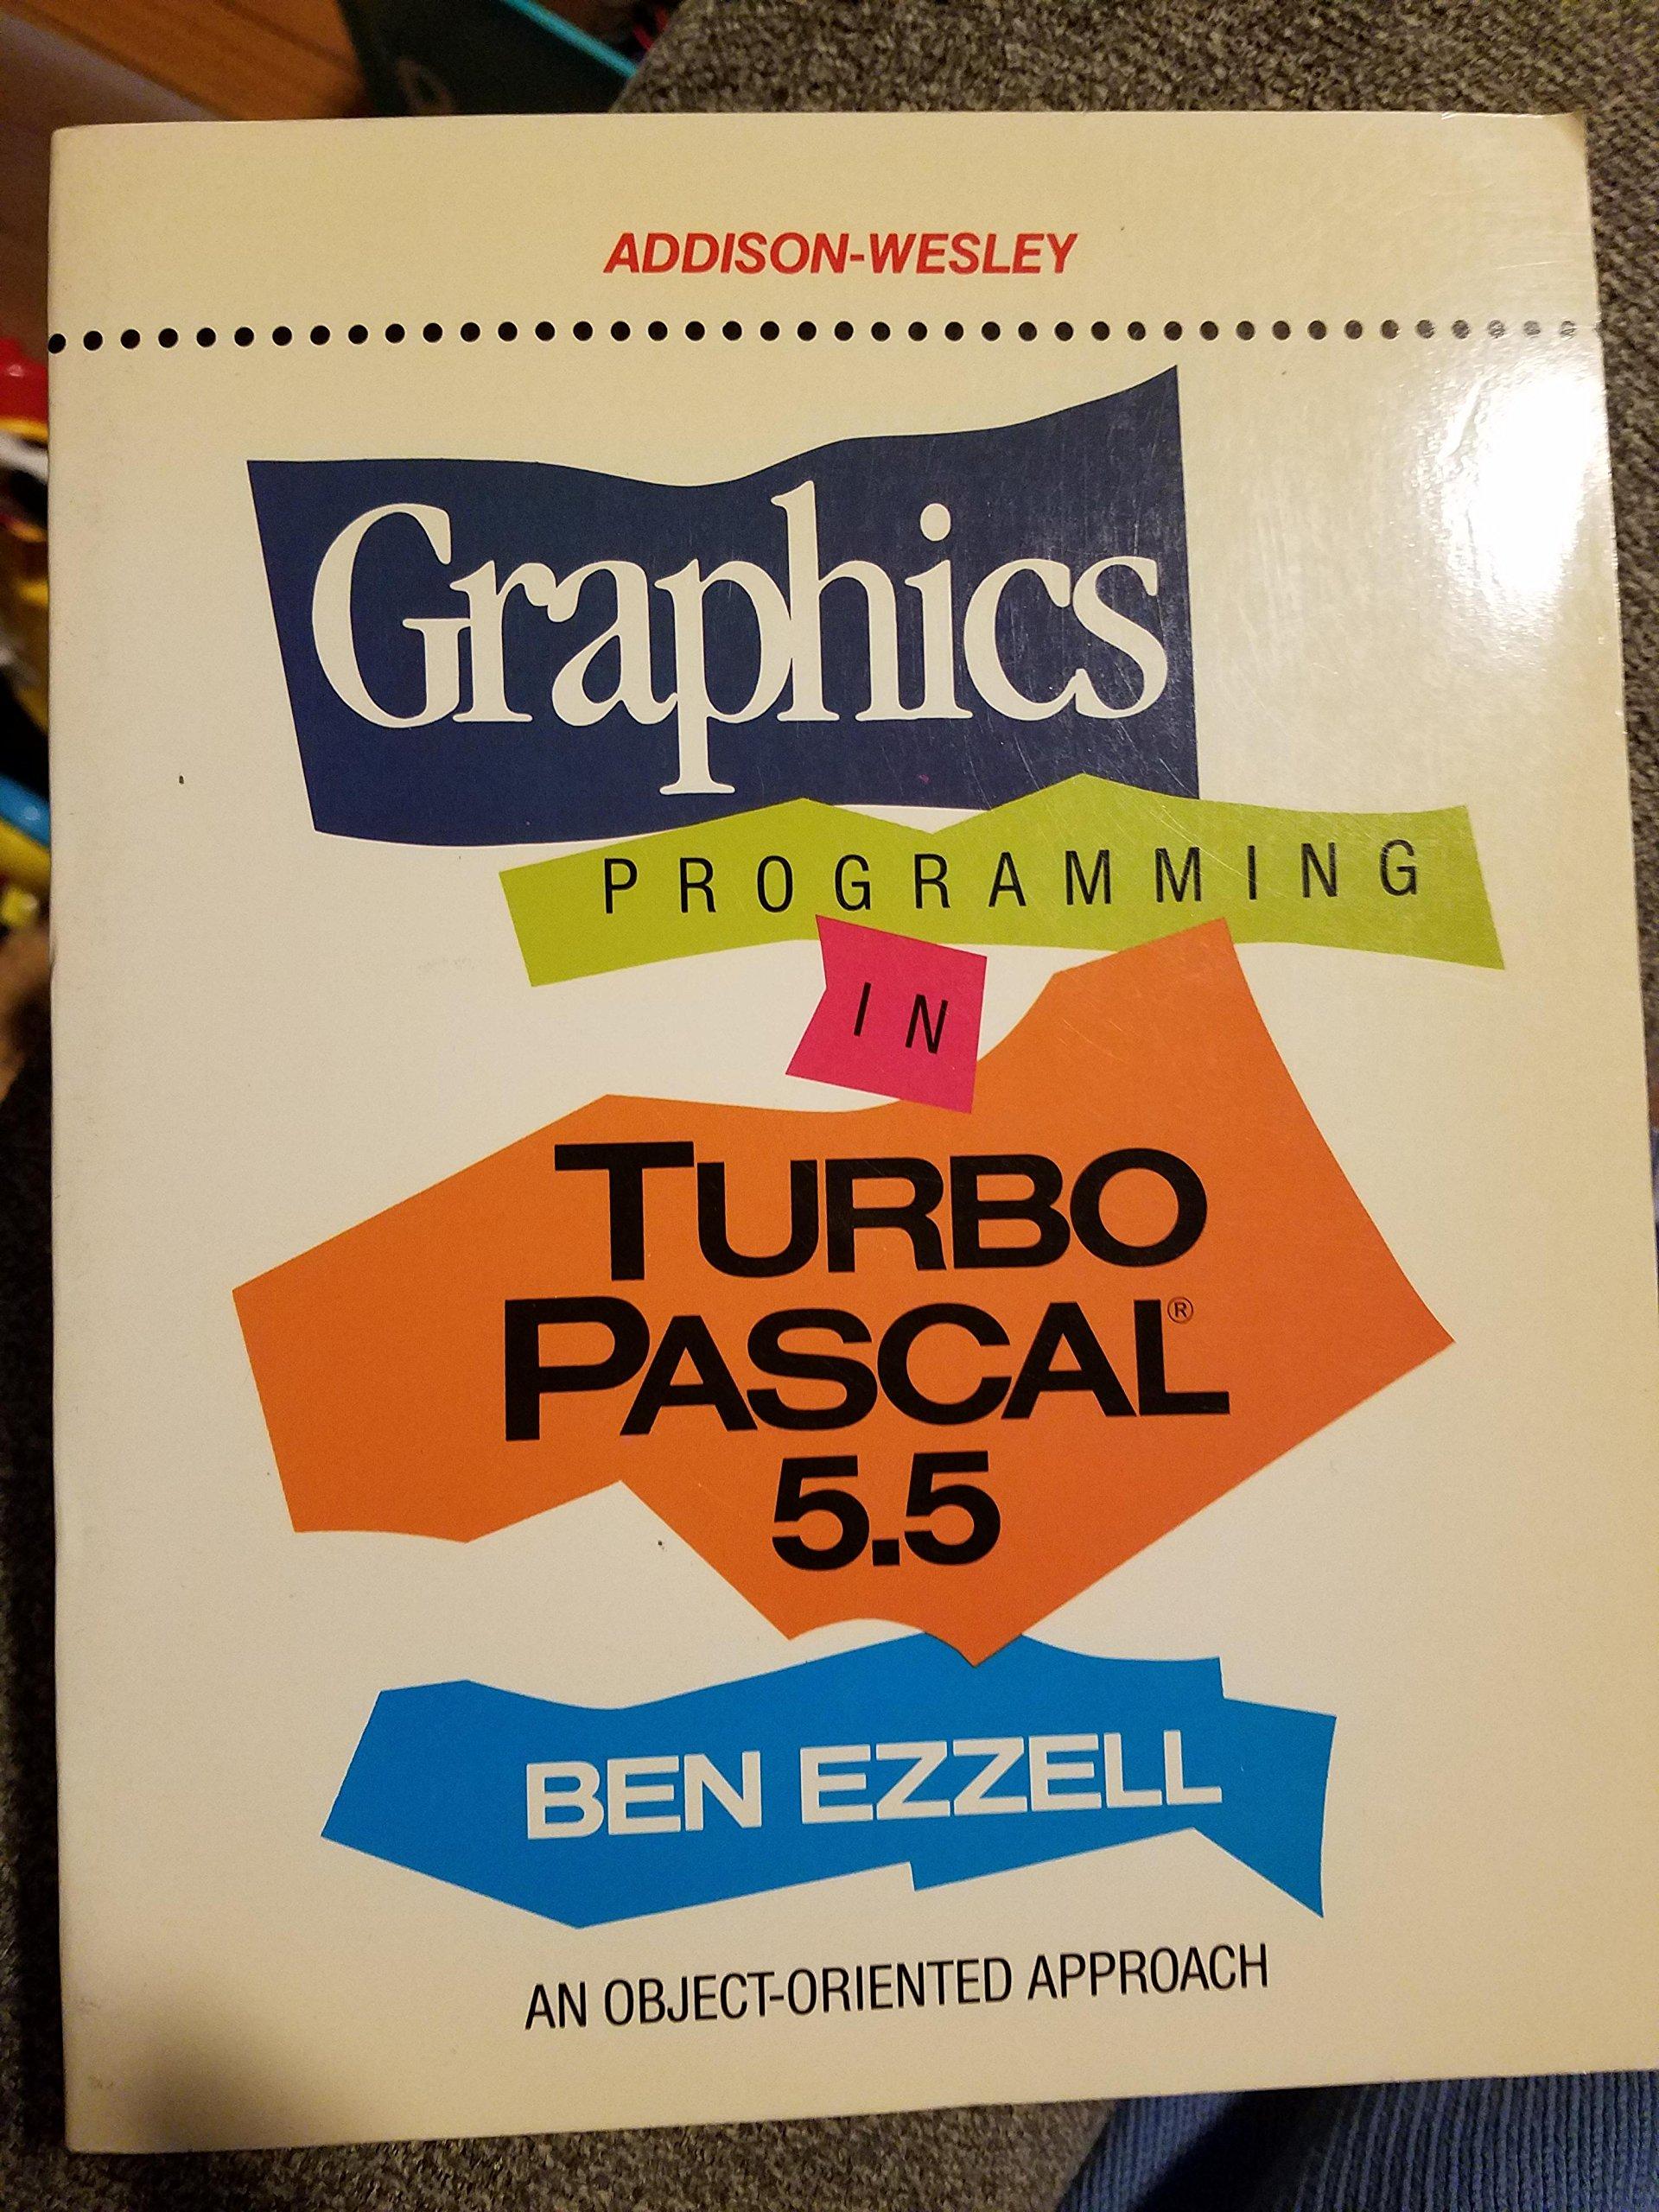 Graphics Programming in Turbo PASCAL 5.5: An Object-oriented Approach: Amazon.es: Ben Ezzell: Libros en idiomas extranjeros